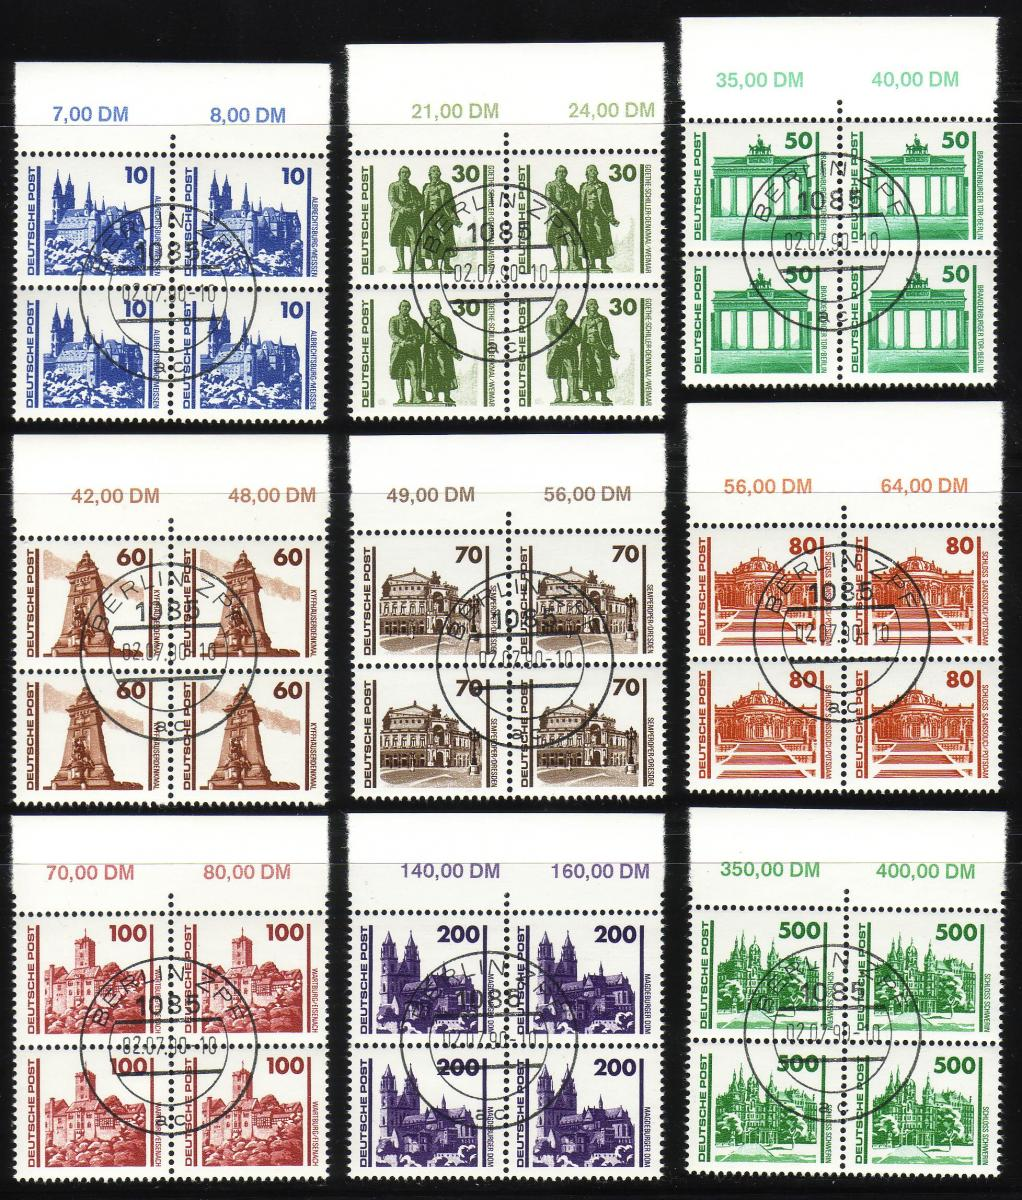 3344-3352 Bauwerke 1990, Satz im Oberrand-Viererblock gestempelt VS-O Berlin ZPF 0